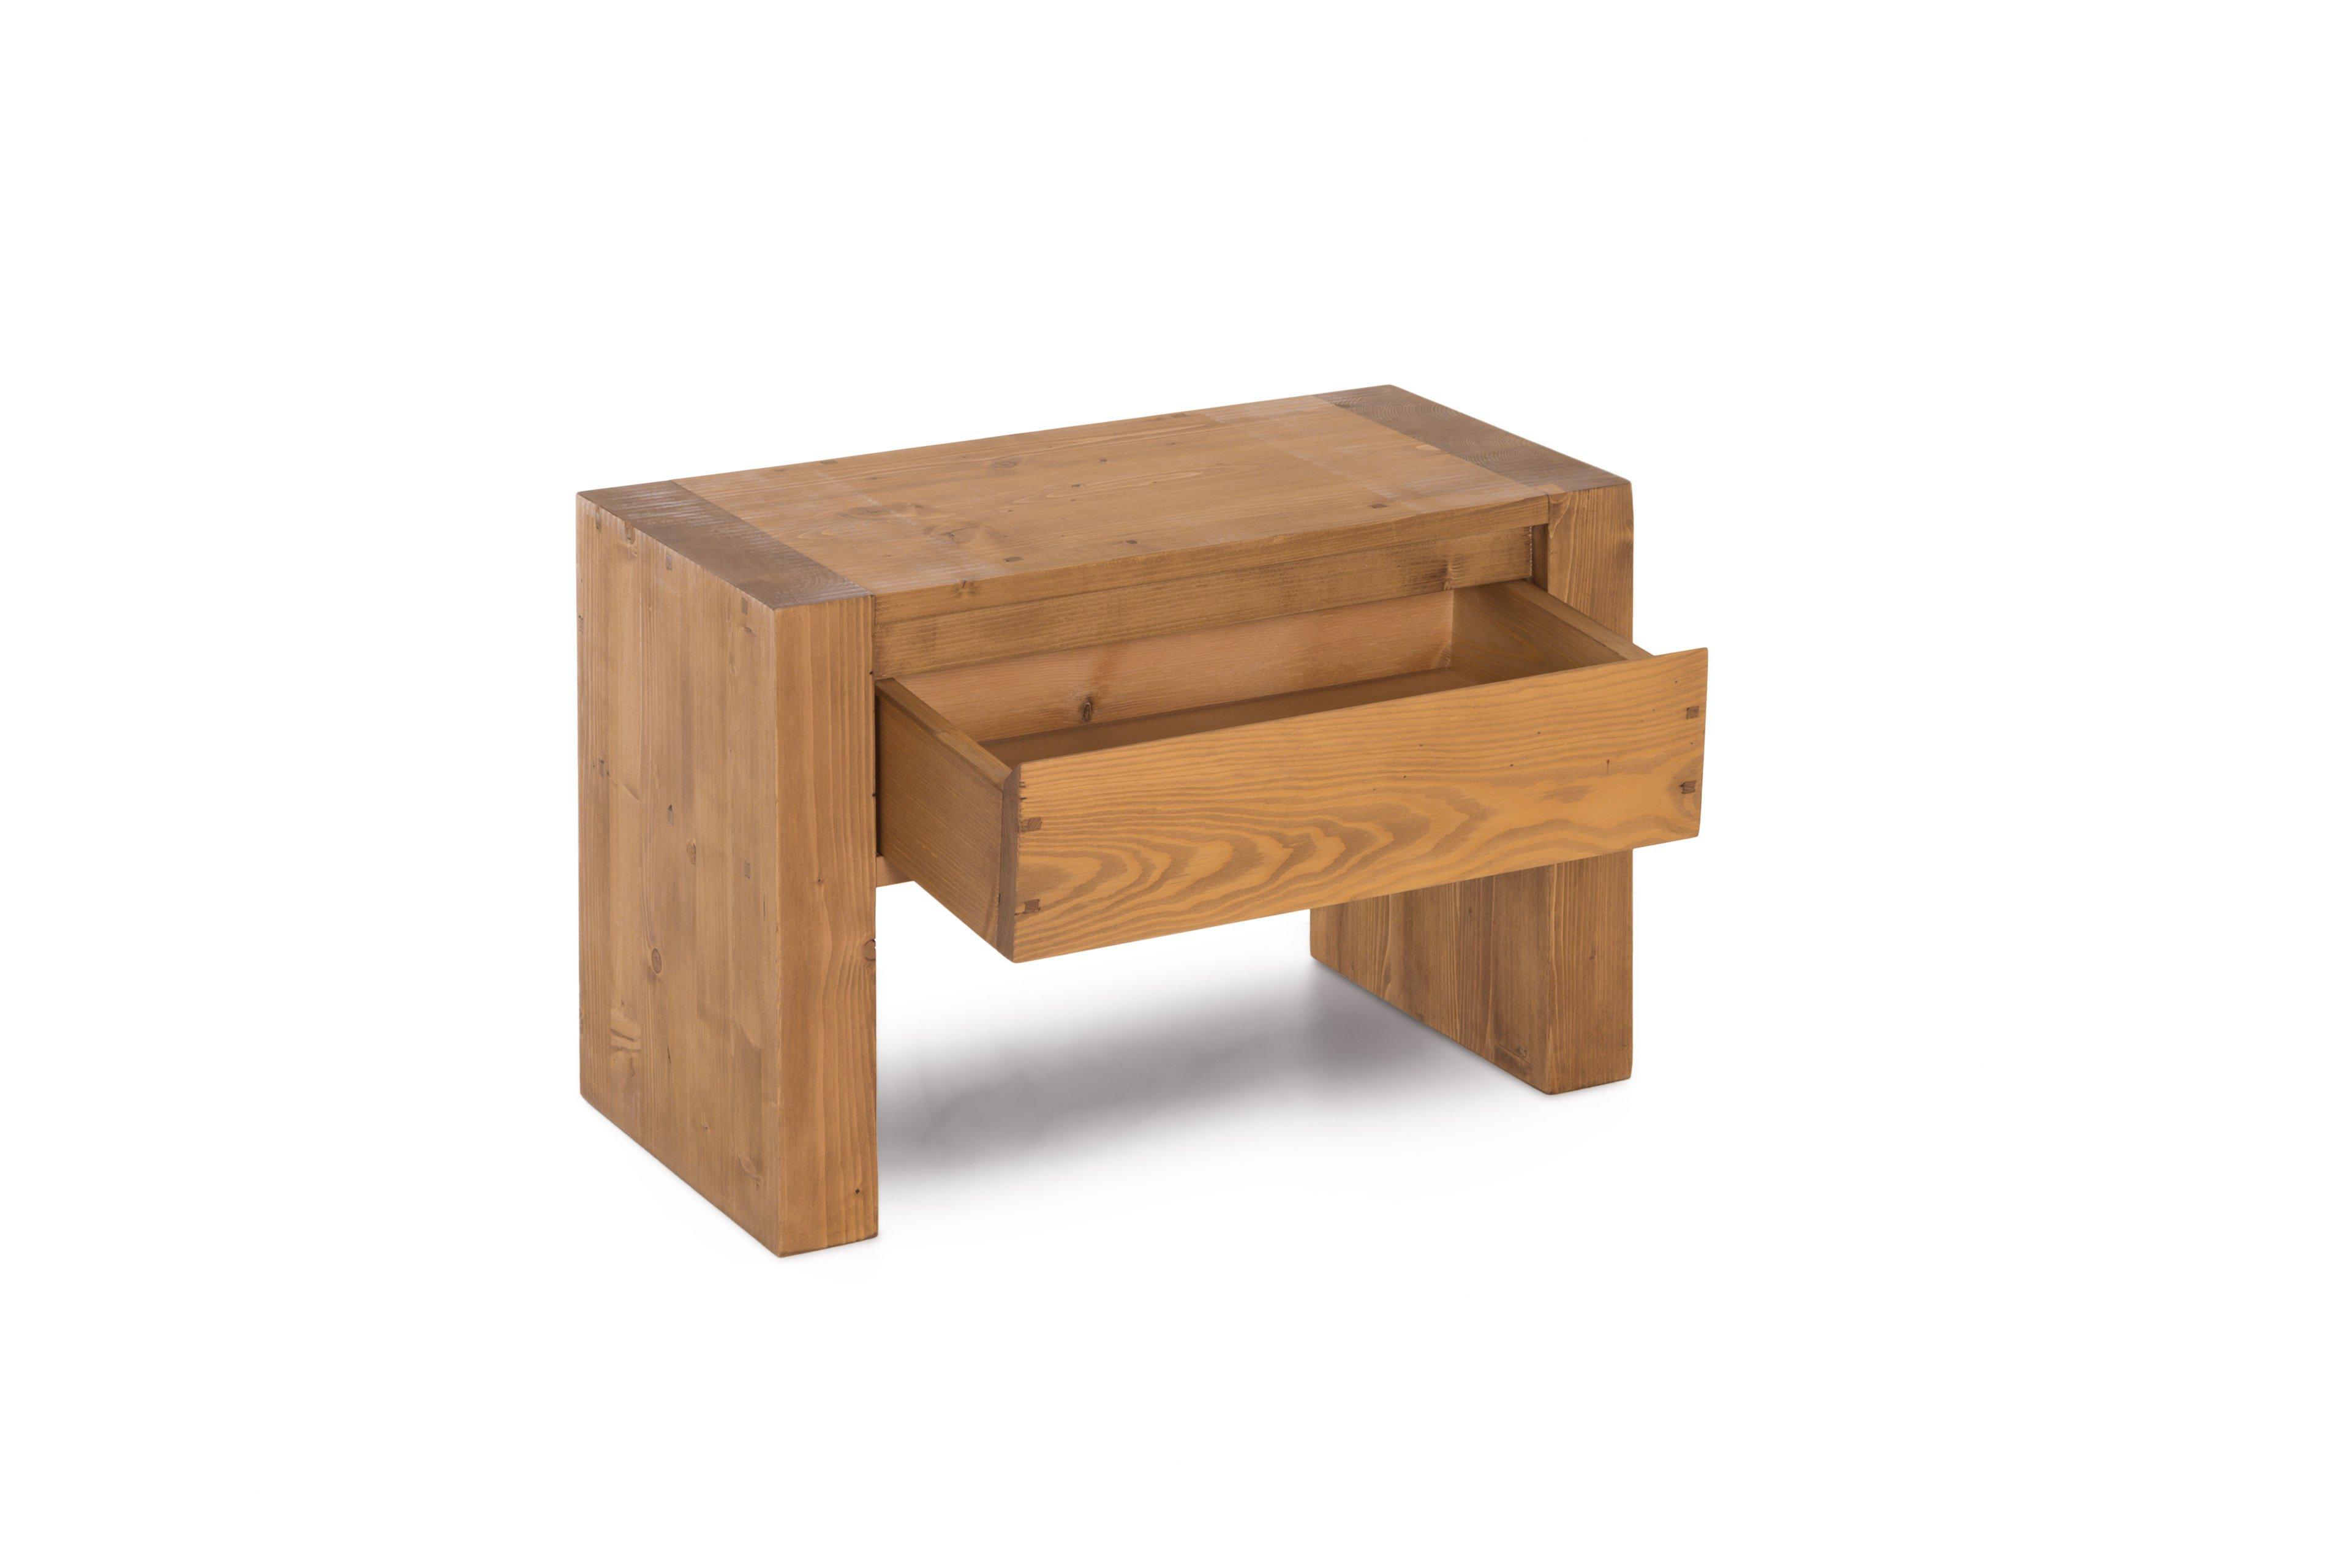 armina kollektion letz holz bett 180x200 m bel letz. Black Bedroom Furniture Sets. Home Design Ideas